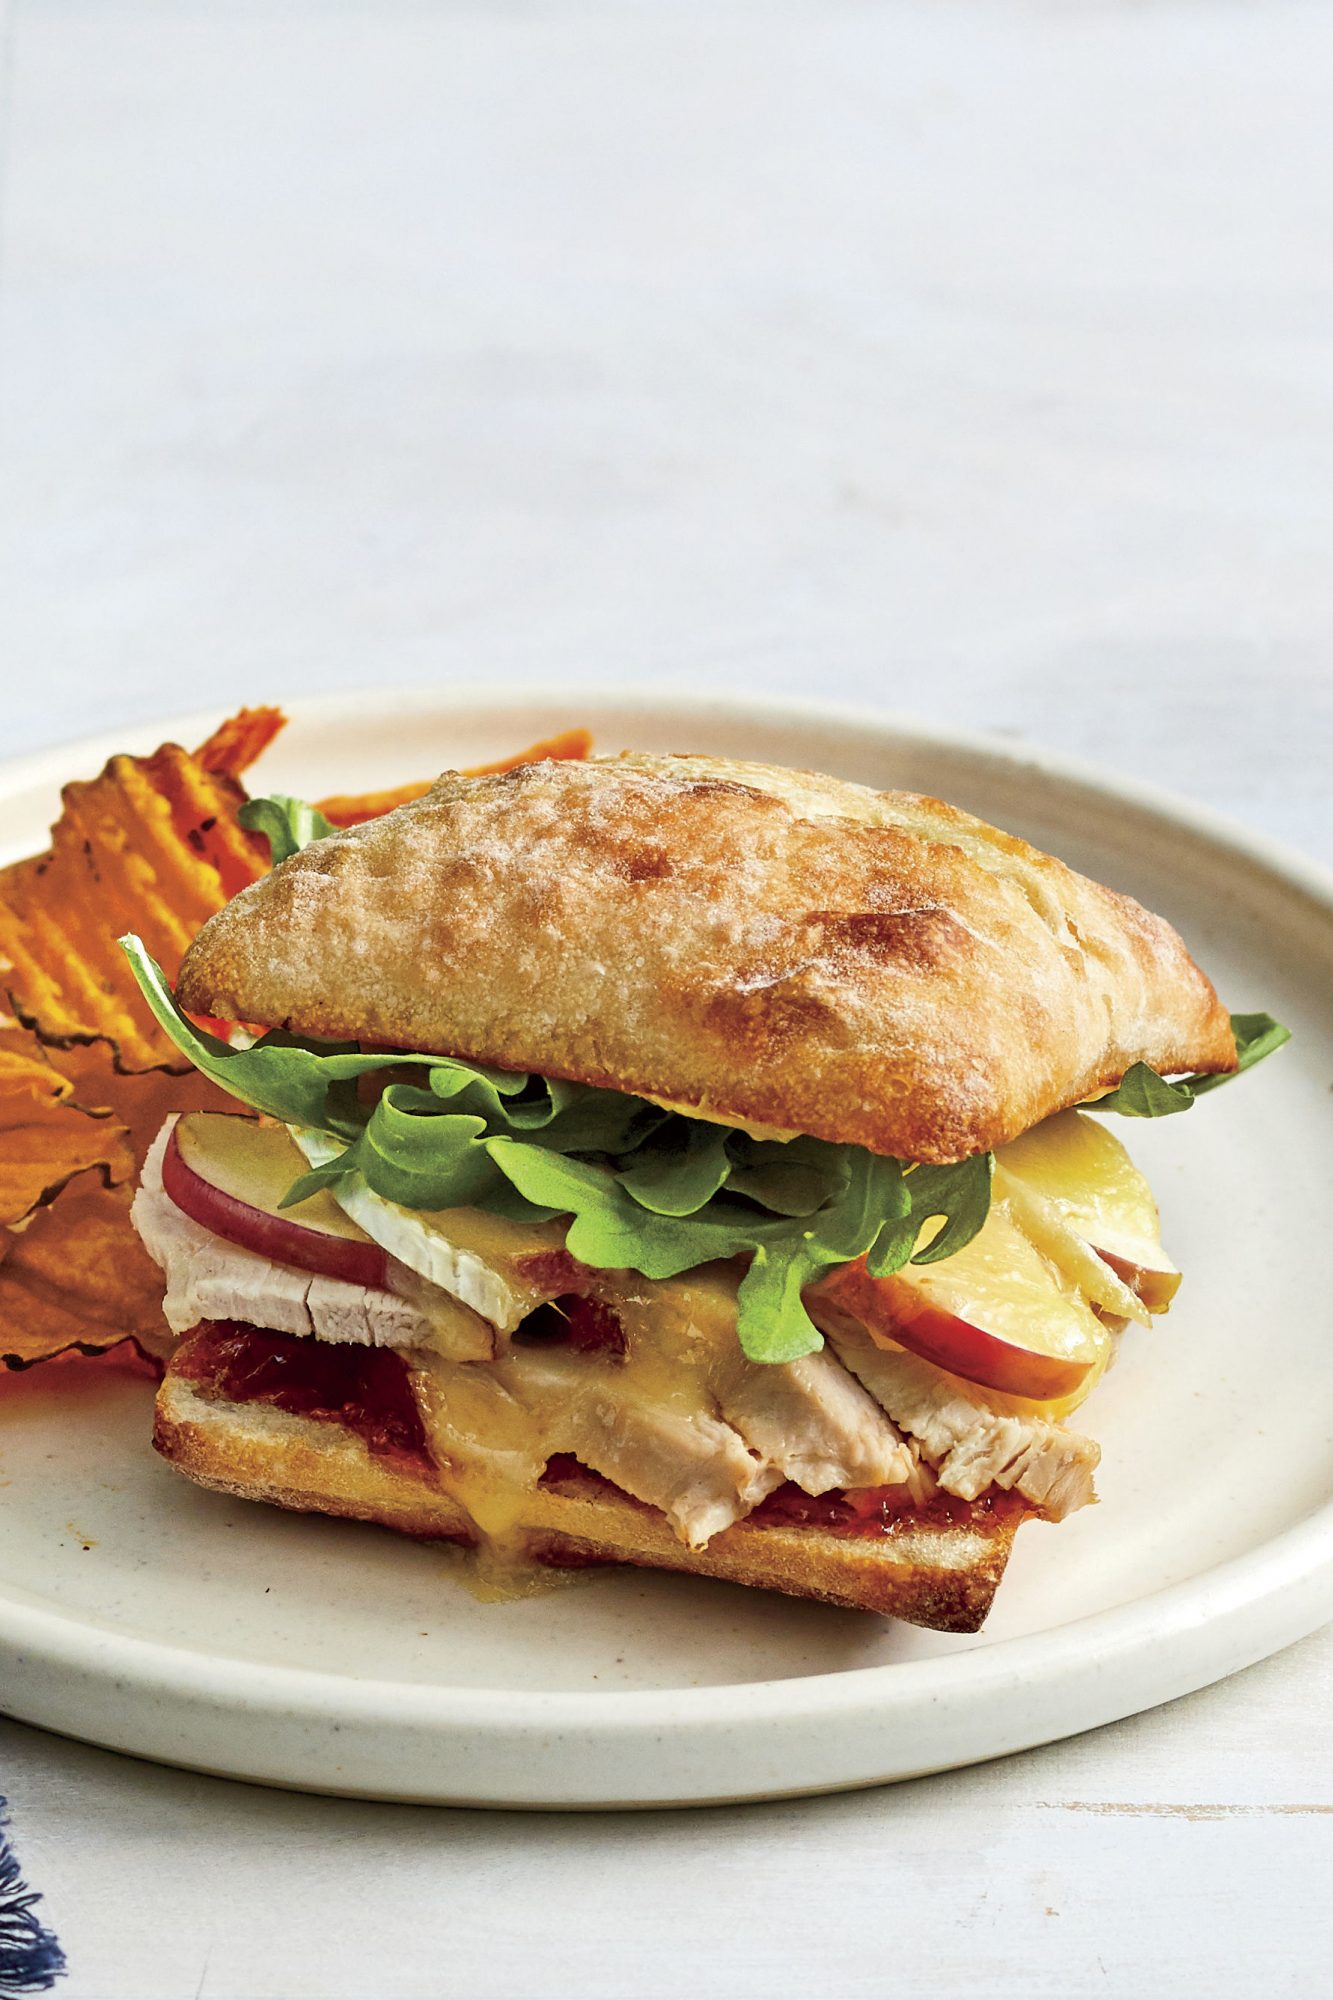 Turkey, Apple, and Brie Sandwich